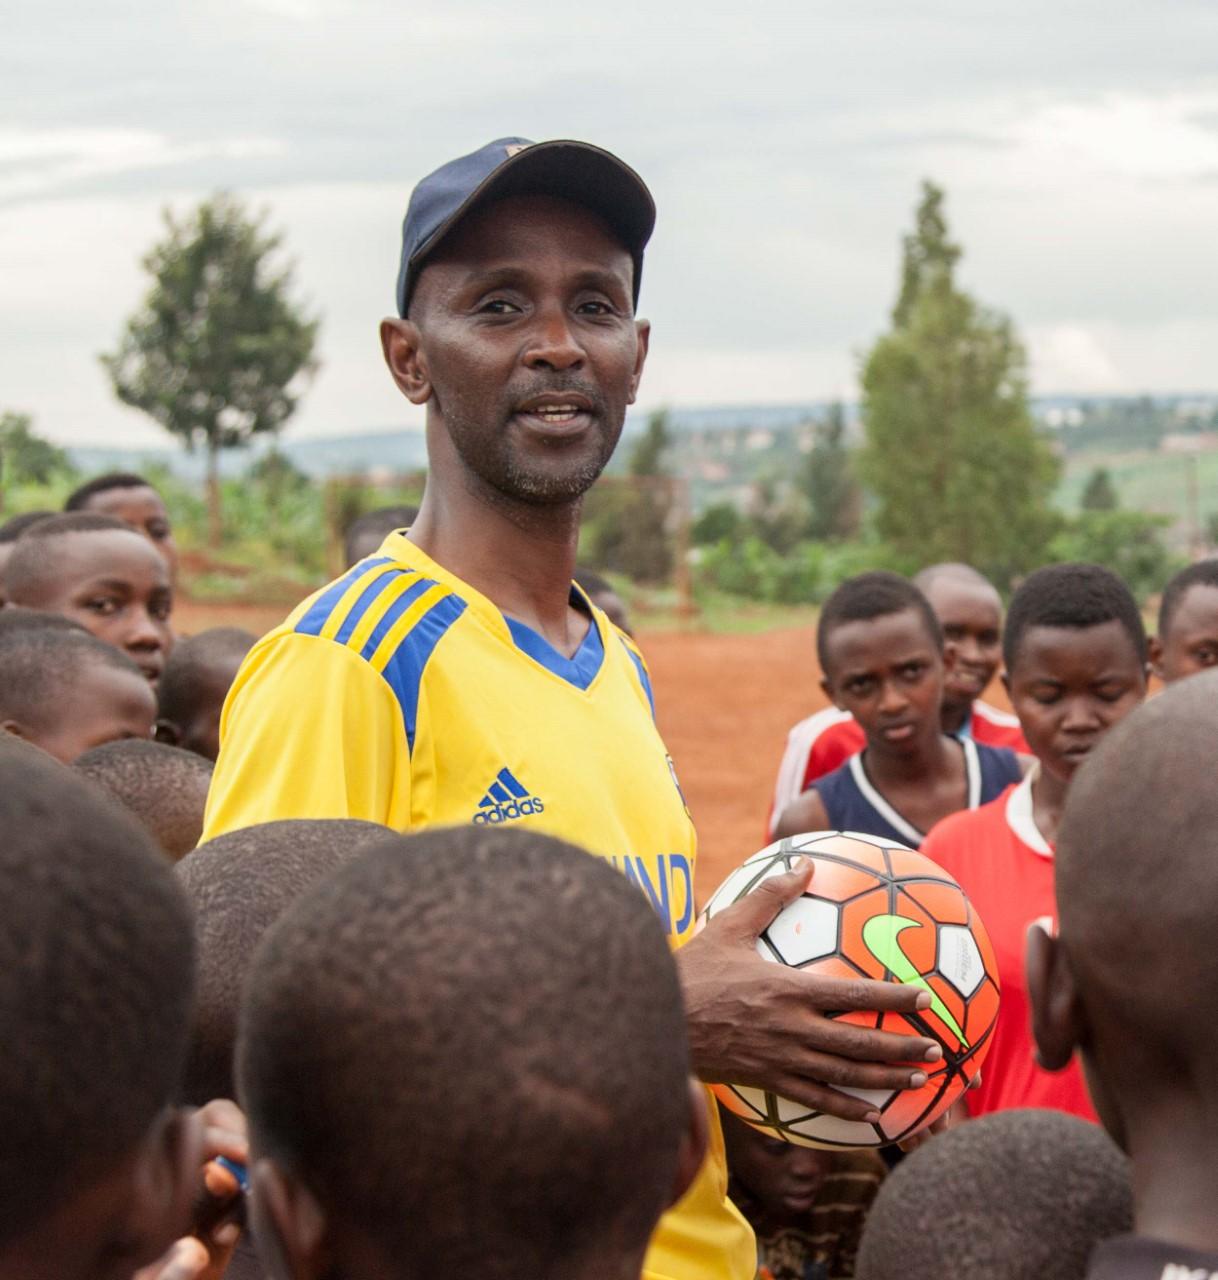 thumbnail_EME in Rwanda by KG.jpg